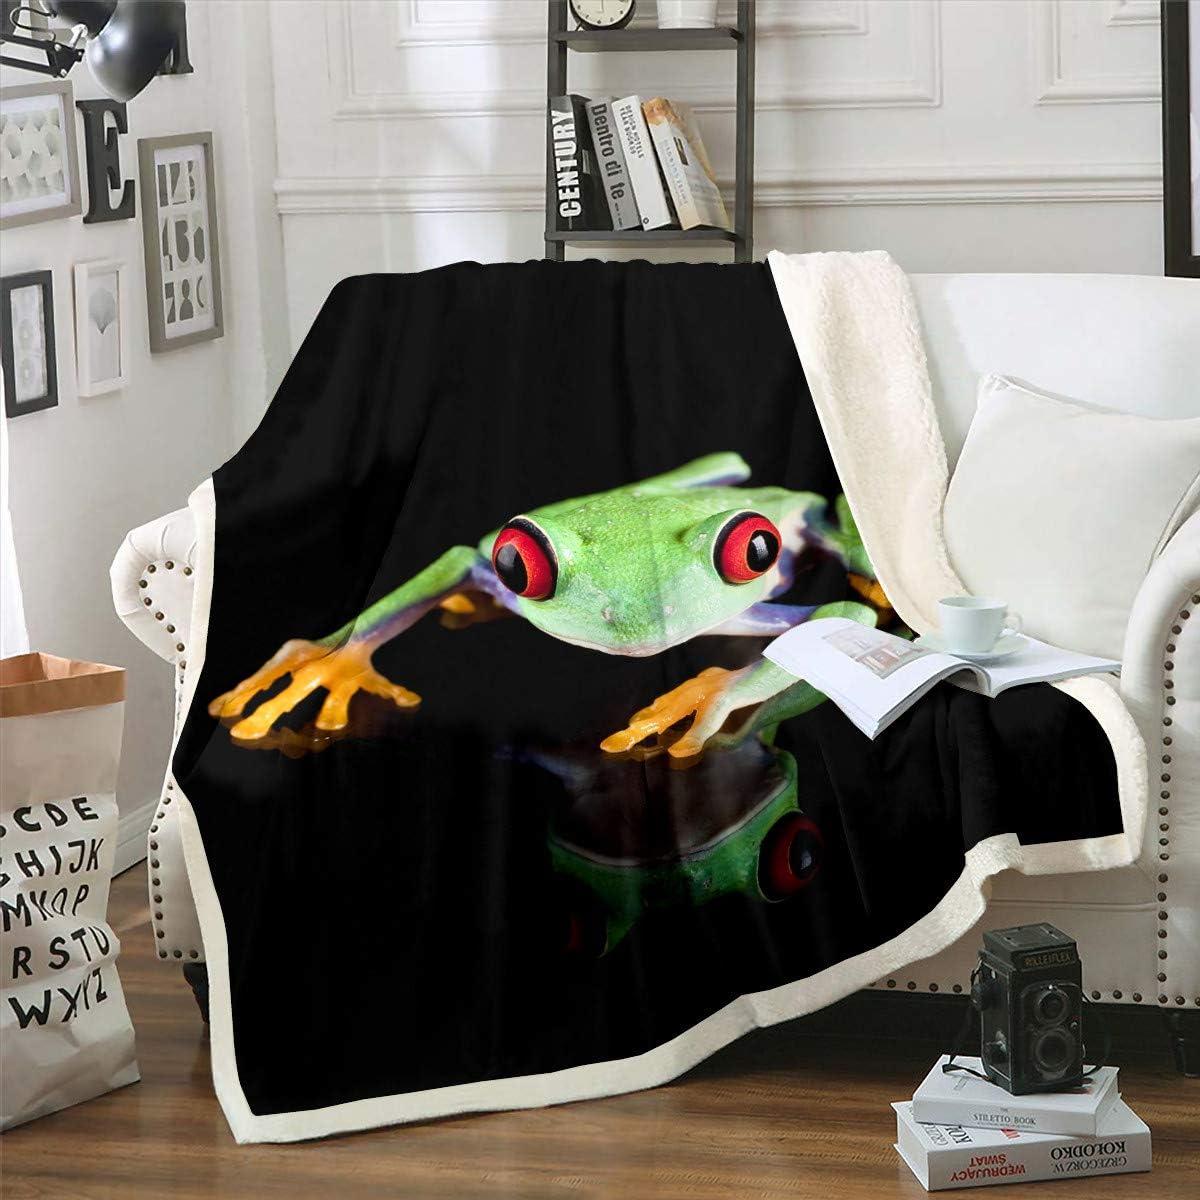 Frog Theme Plush Challenge the lowest price of Japan ☆ Blanket Seasonal Wrap Introduction Cartoon Thro Fleece Pattern Desisn